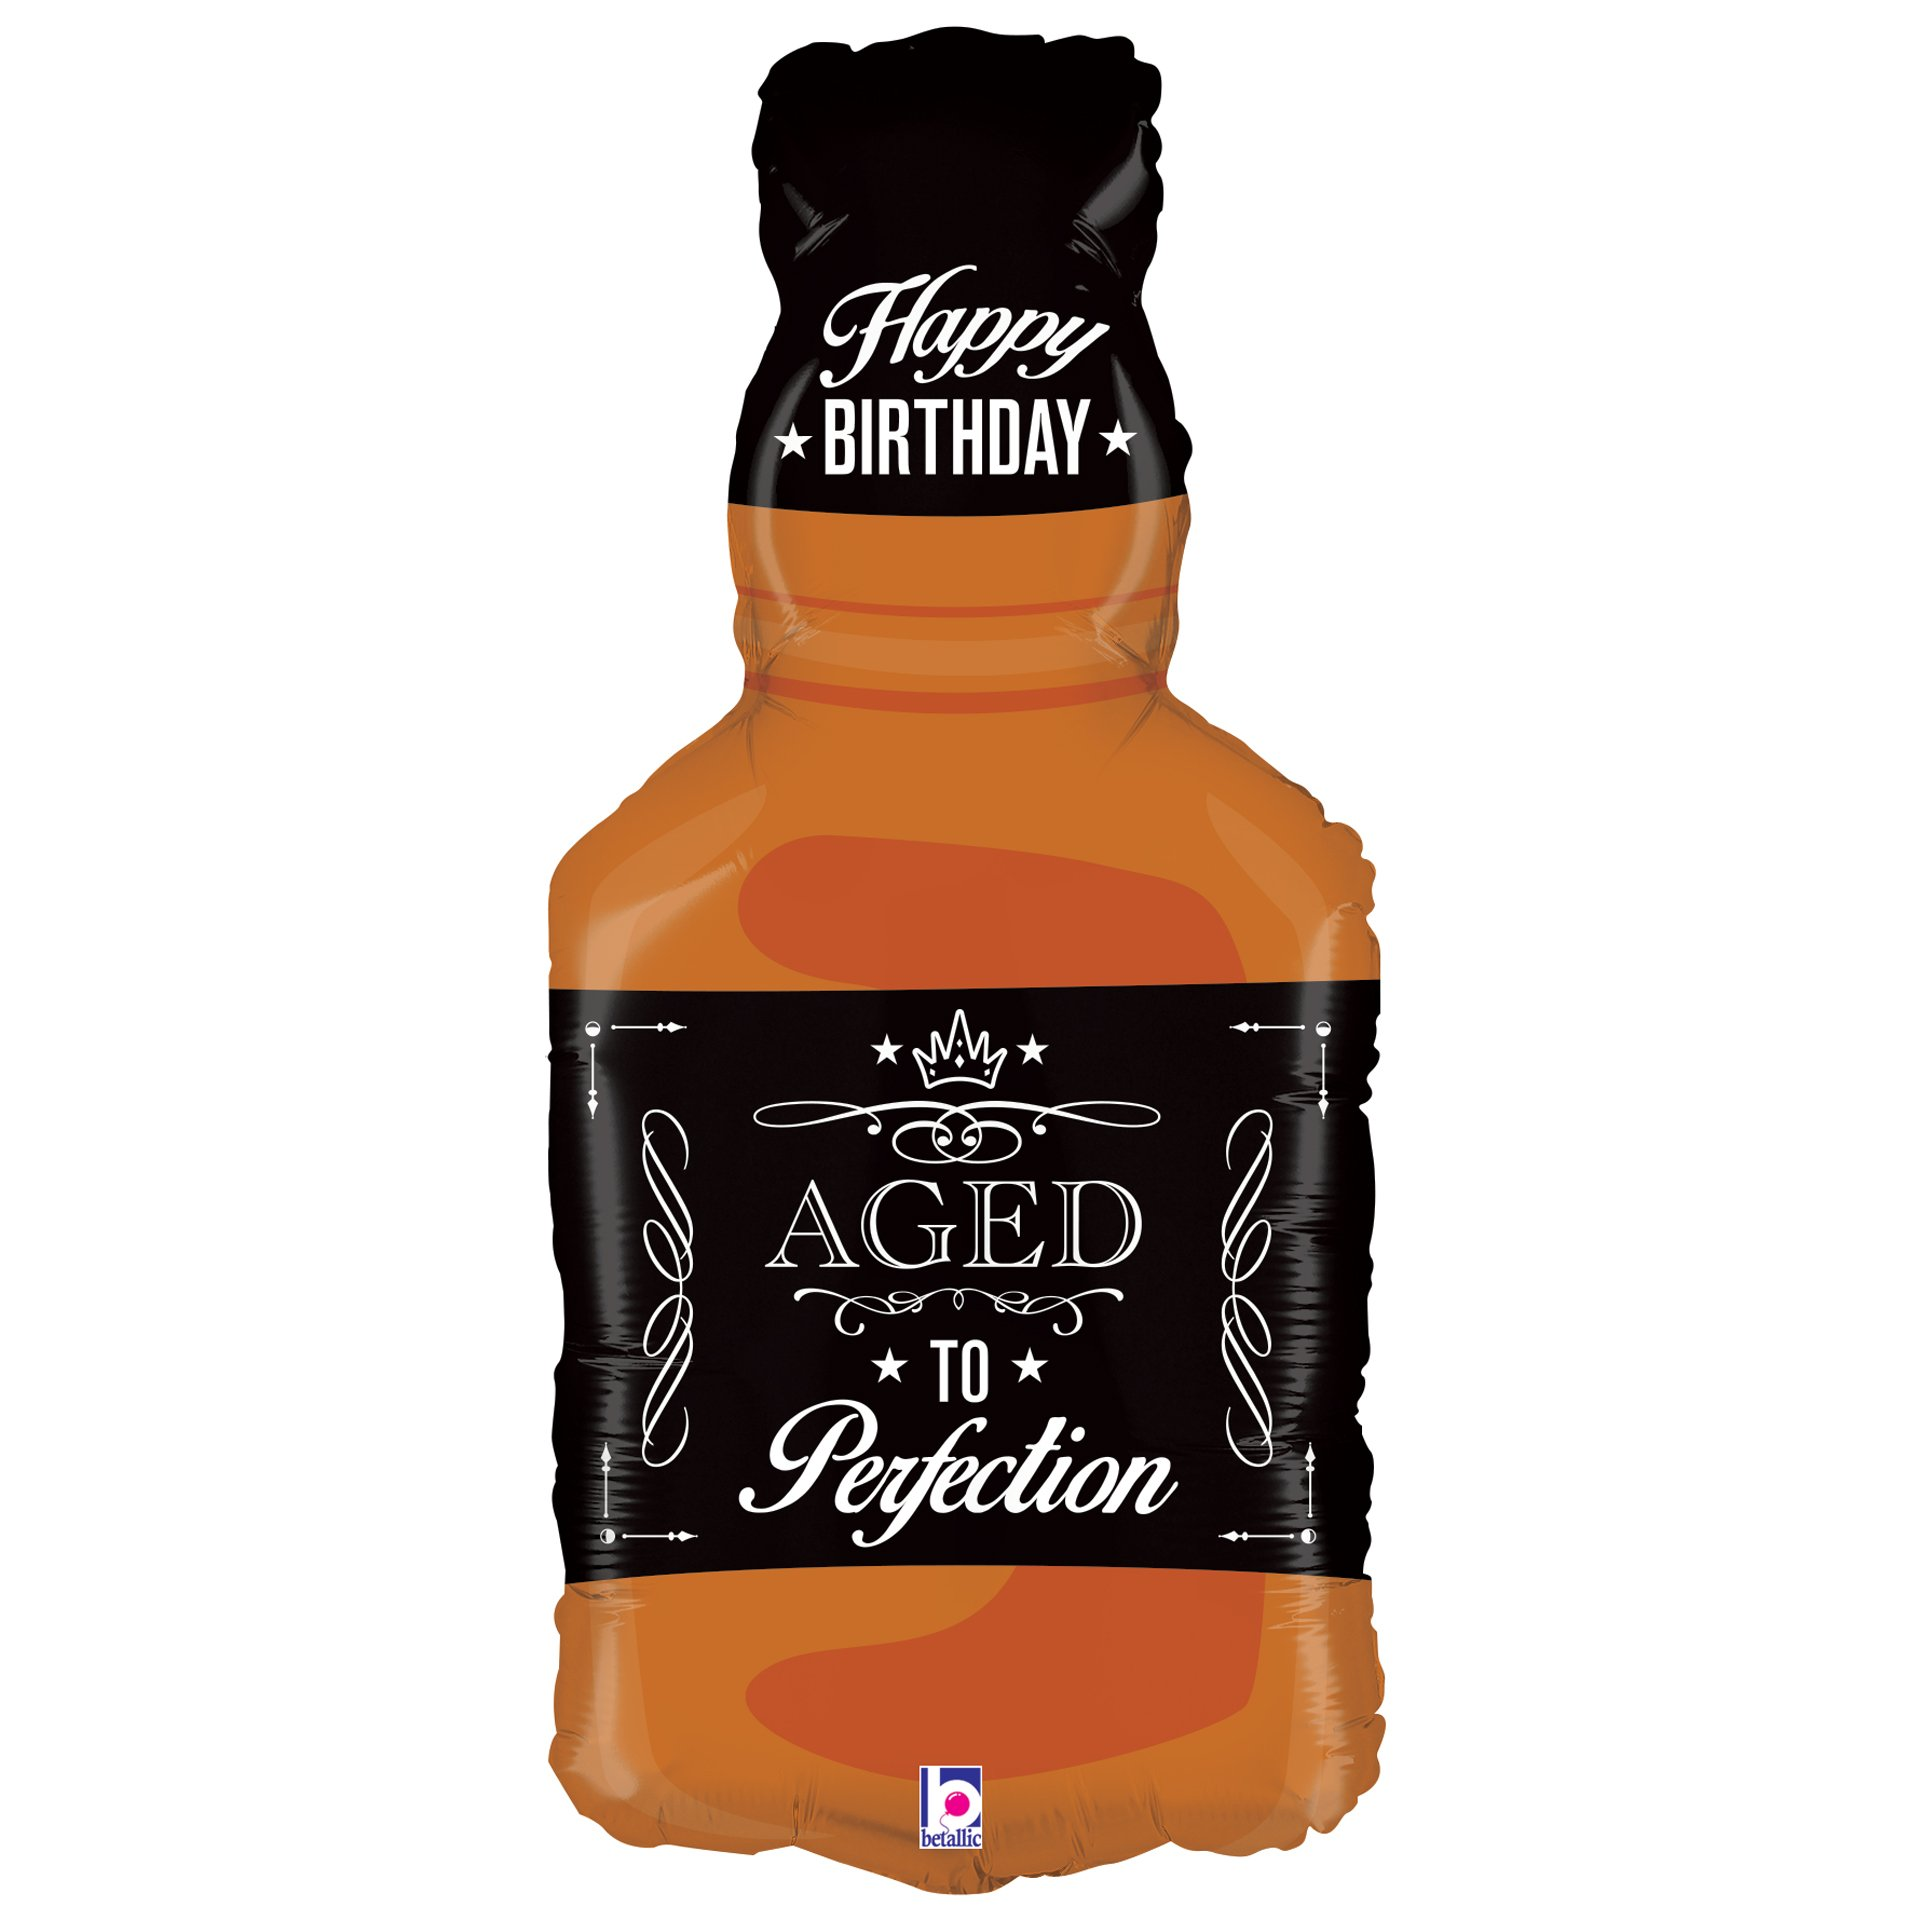 Amazon Betallic Xl 34 Aged To Perfection Whiskey Bottle Super